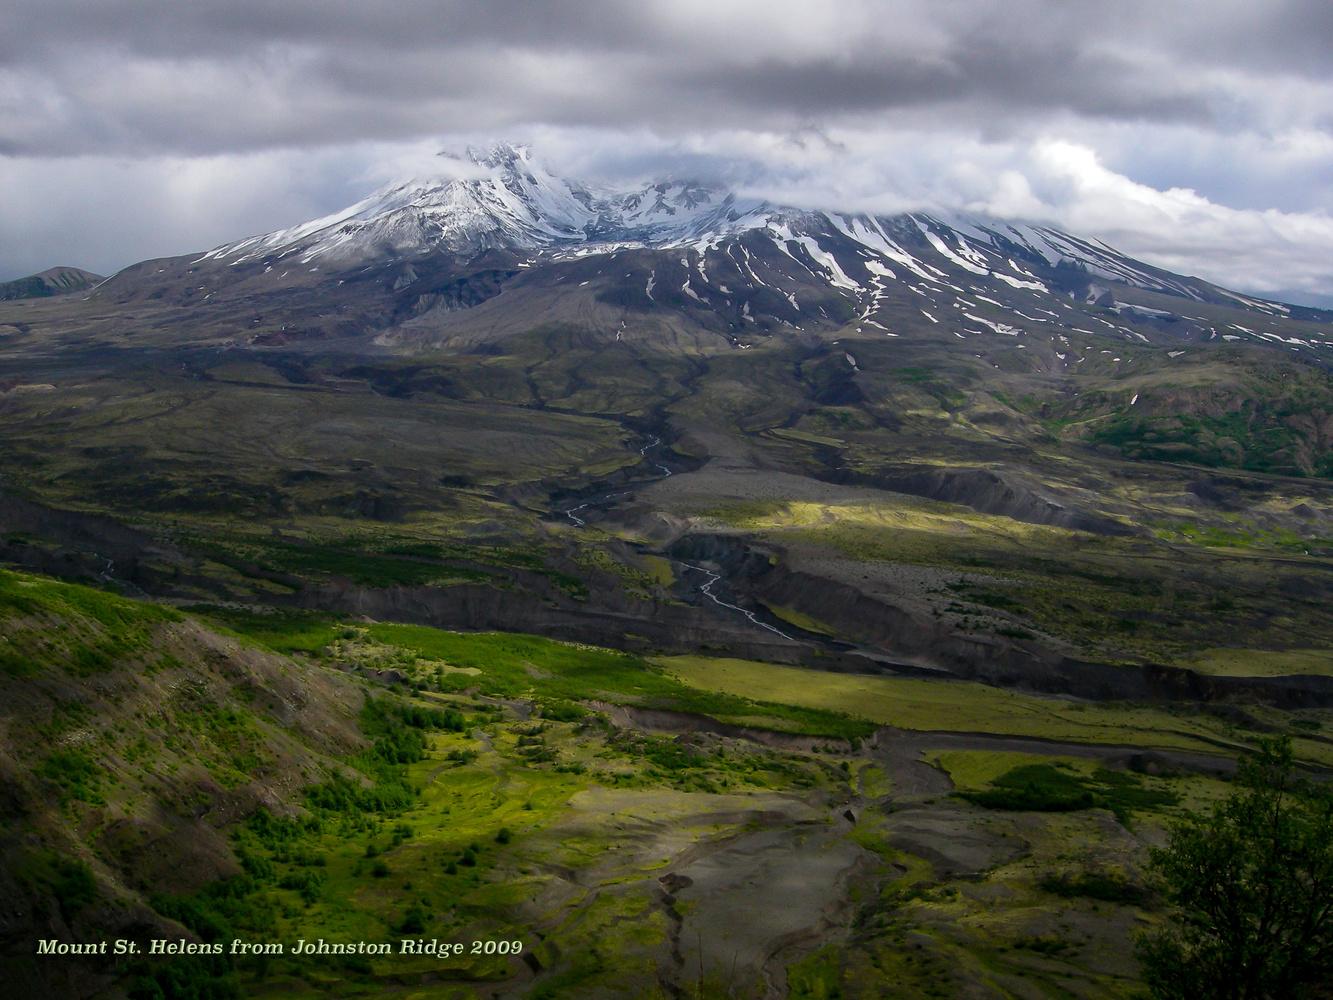 Break in the Clouds, Mount St Helens, Washington by Charles Haacker